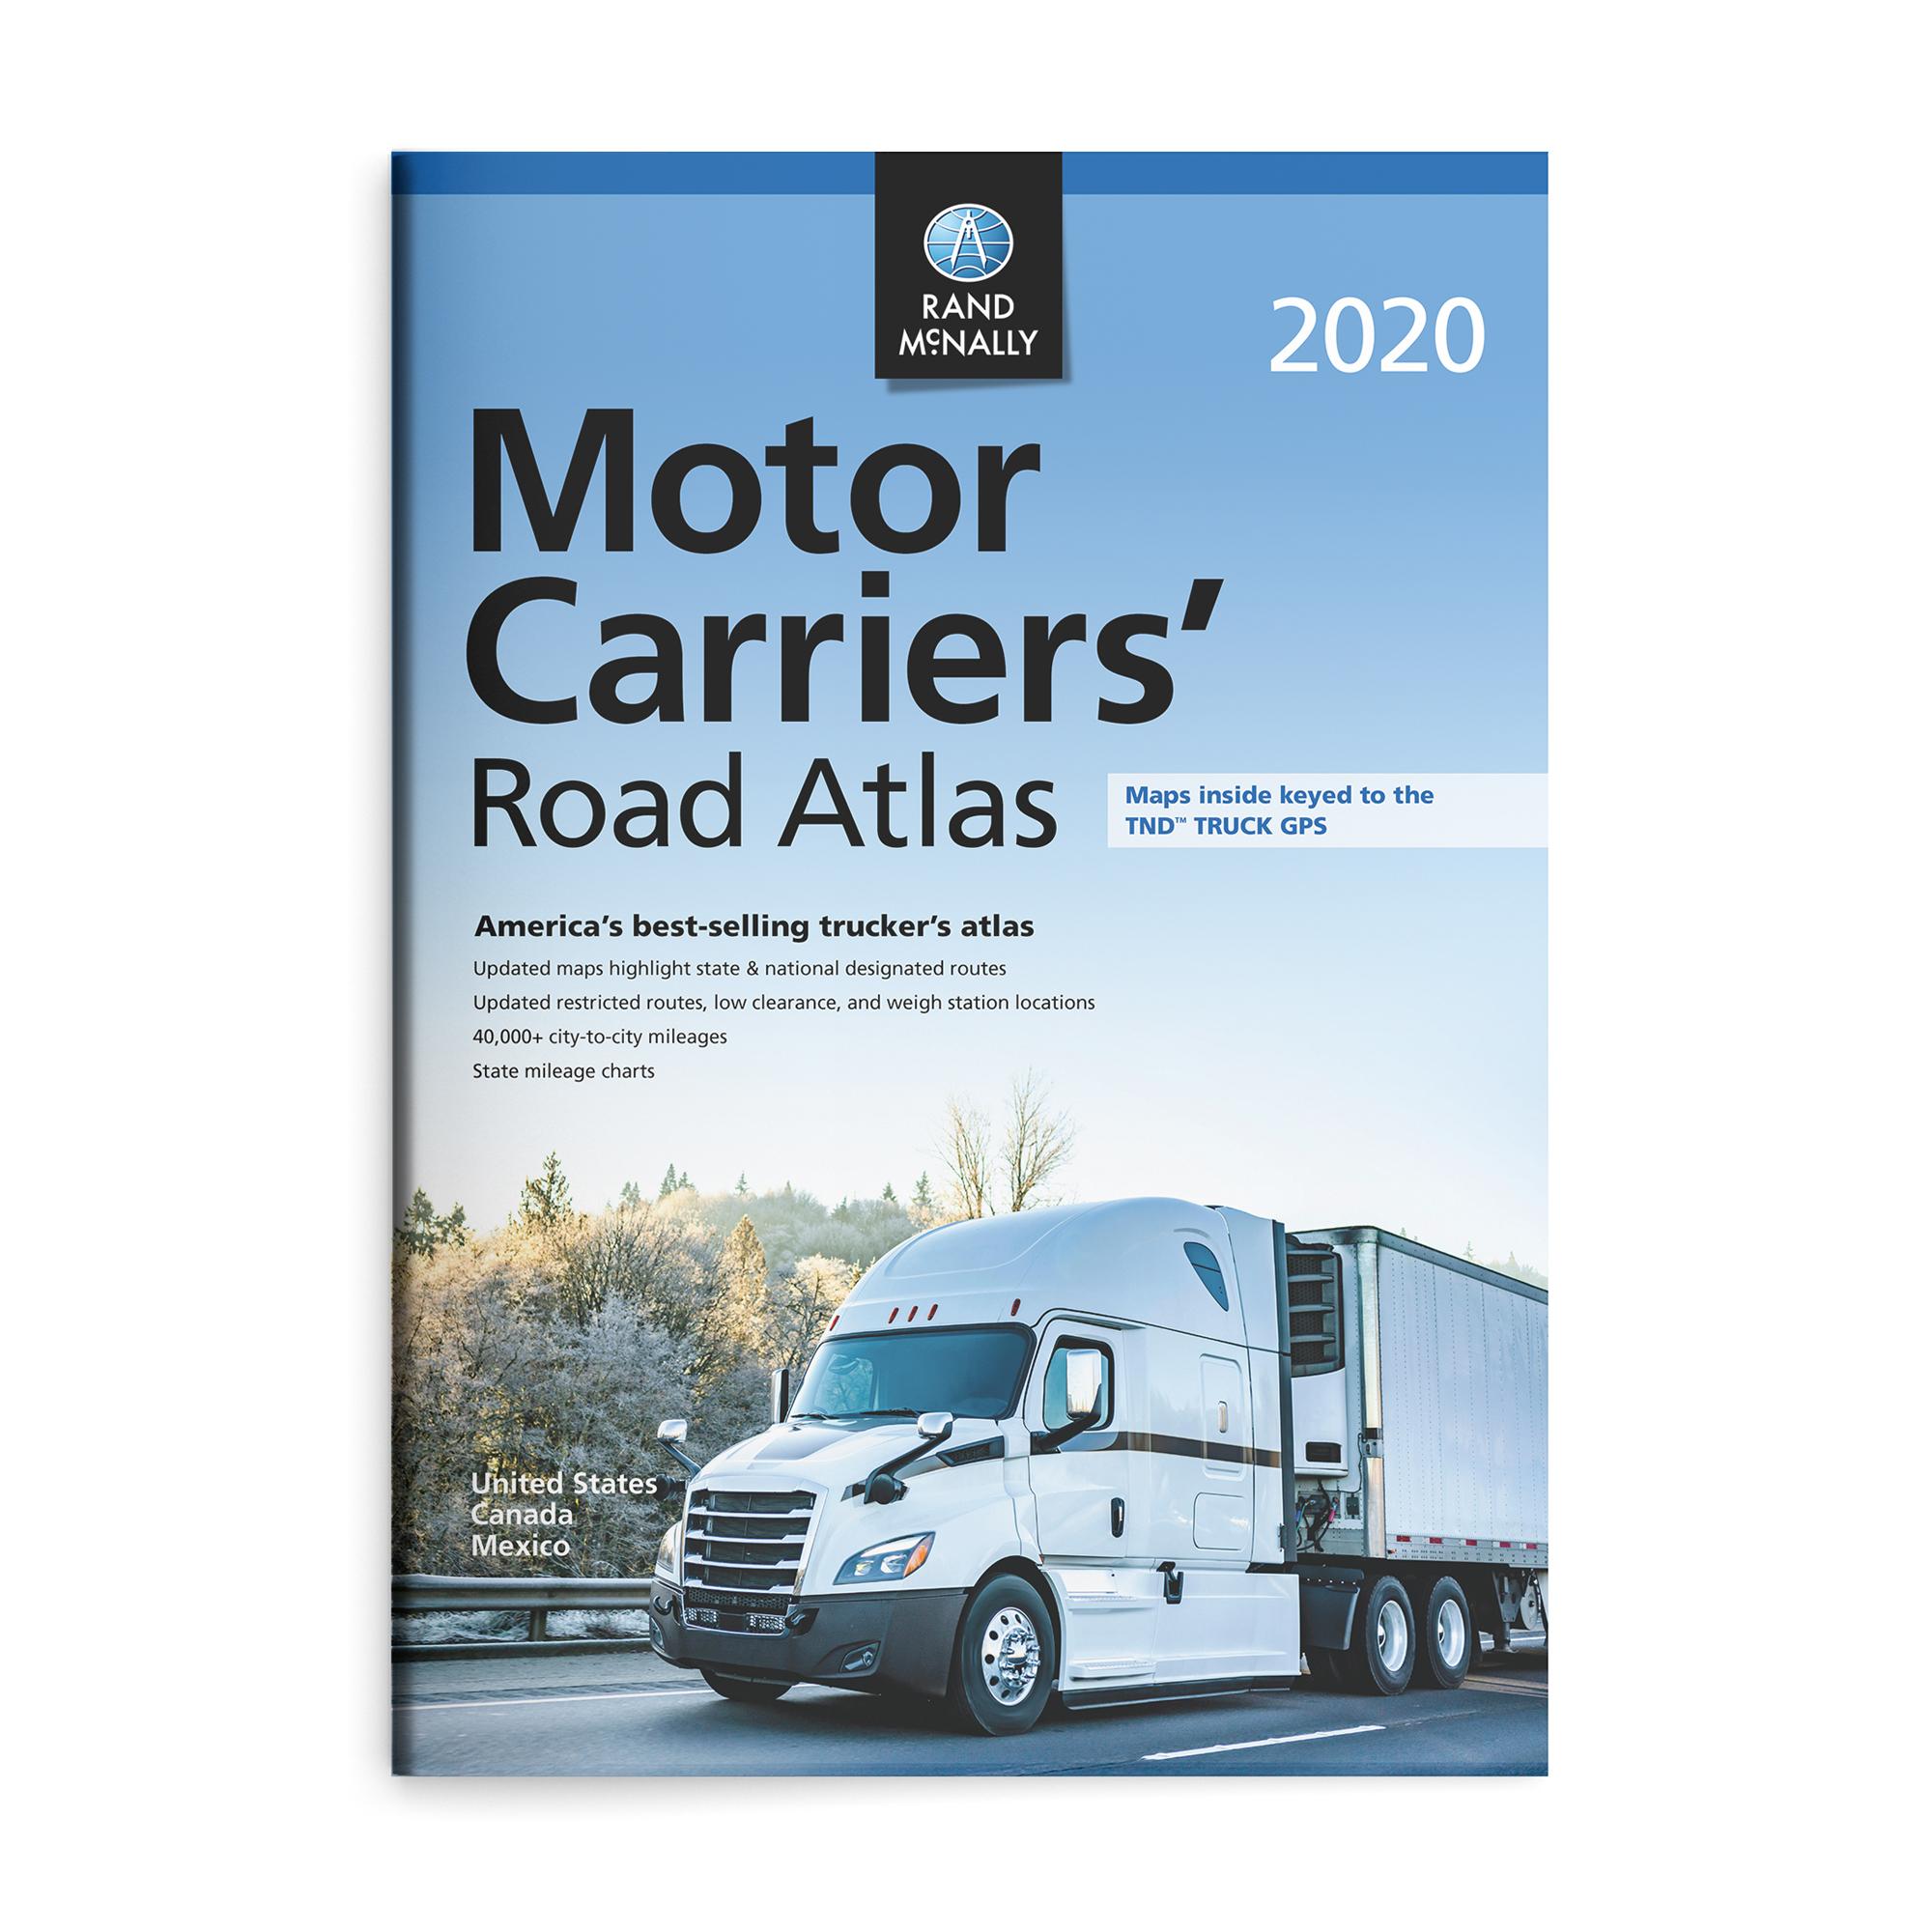 Best Truckers Gps 2020 Rand McNally 2020 Motor Carriers' Road Atlas